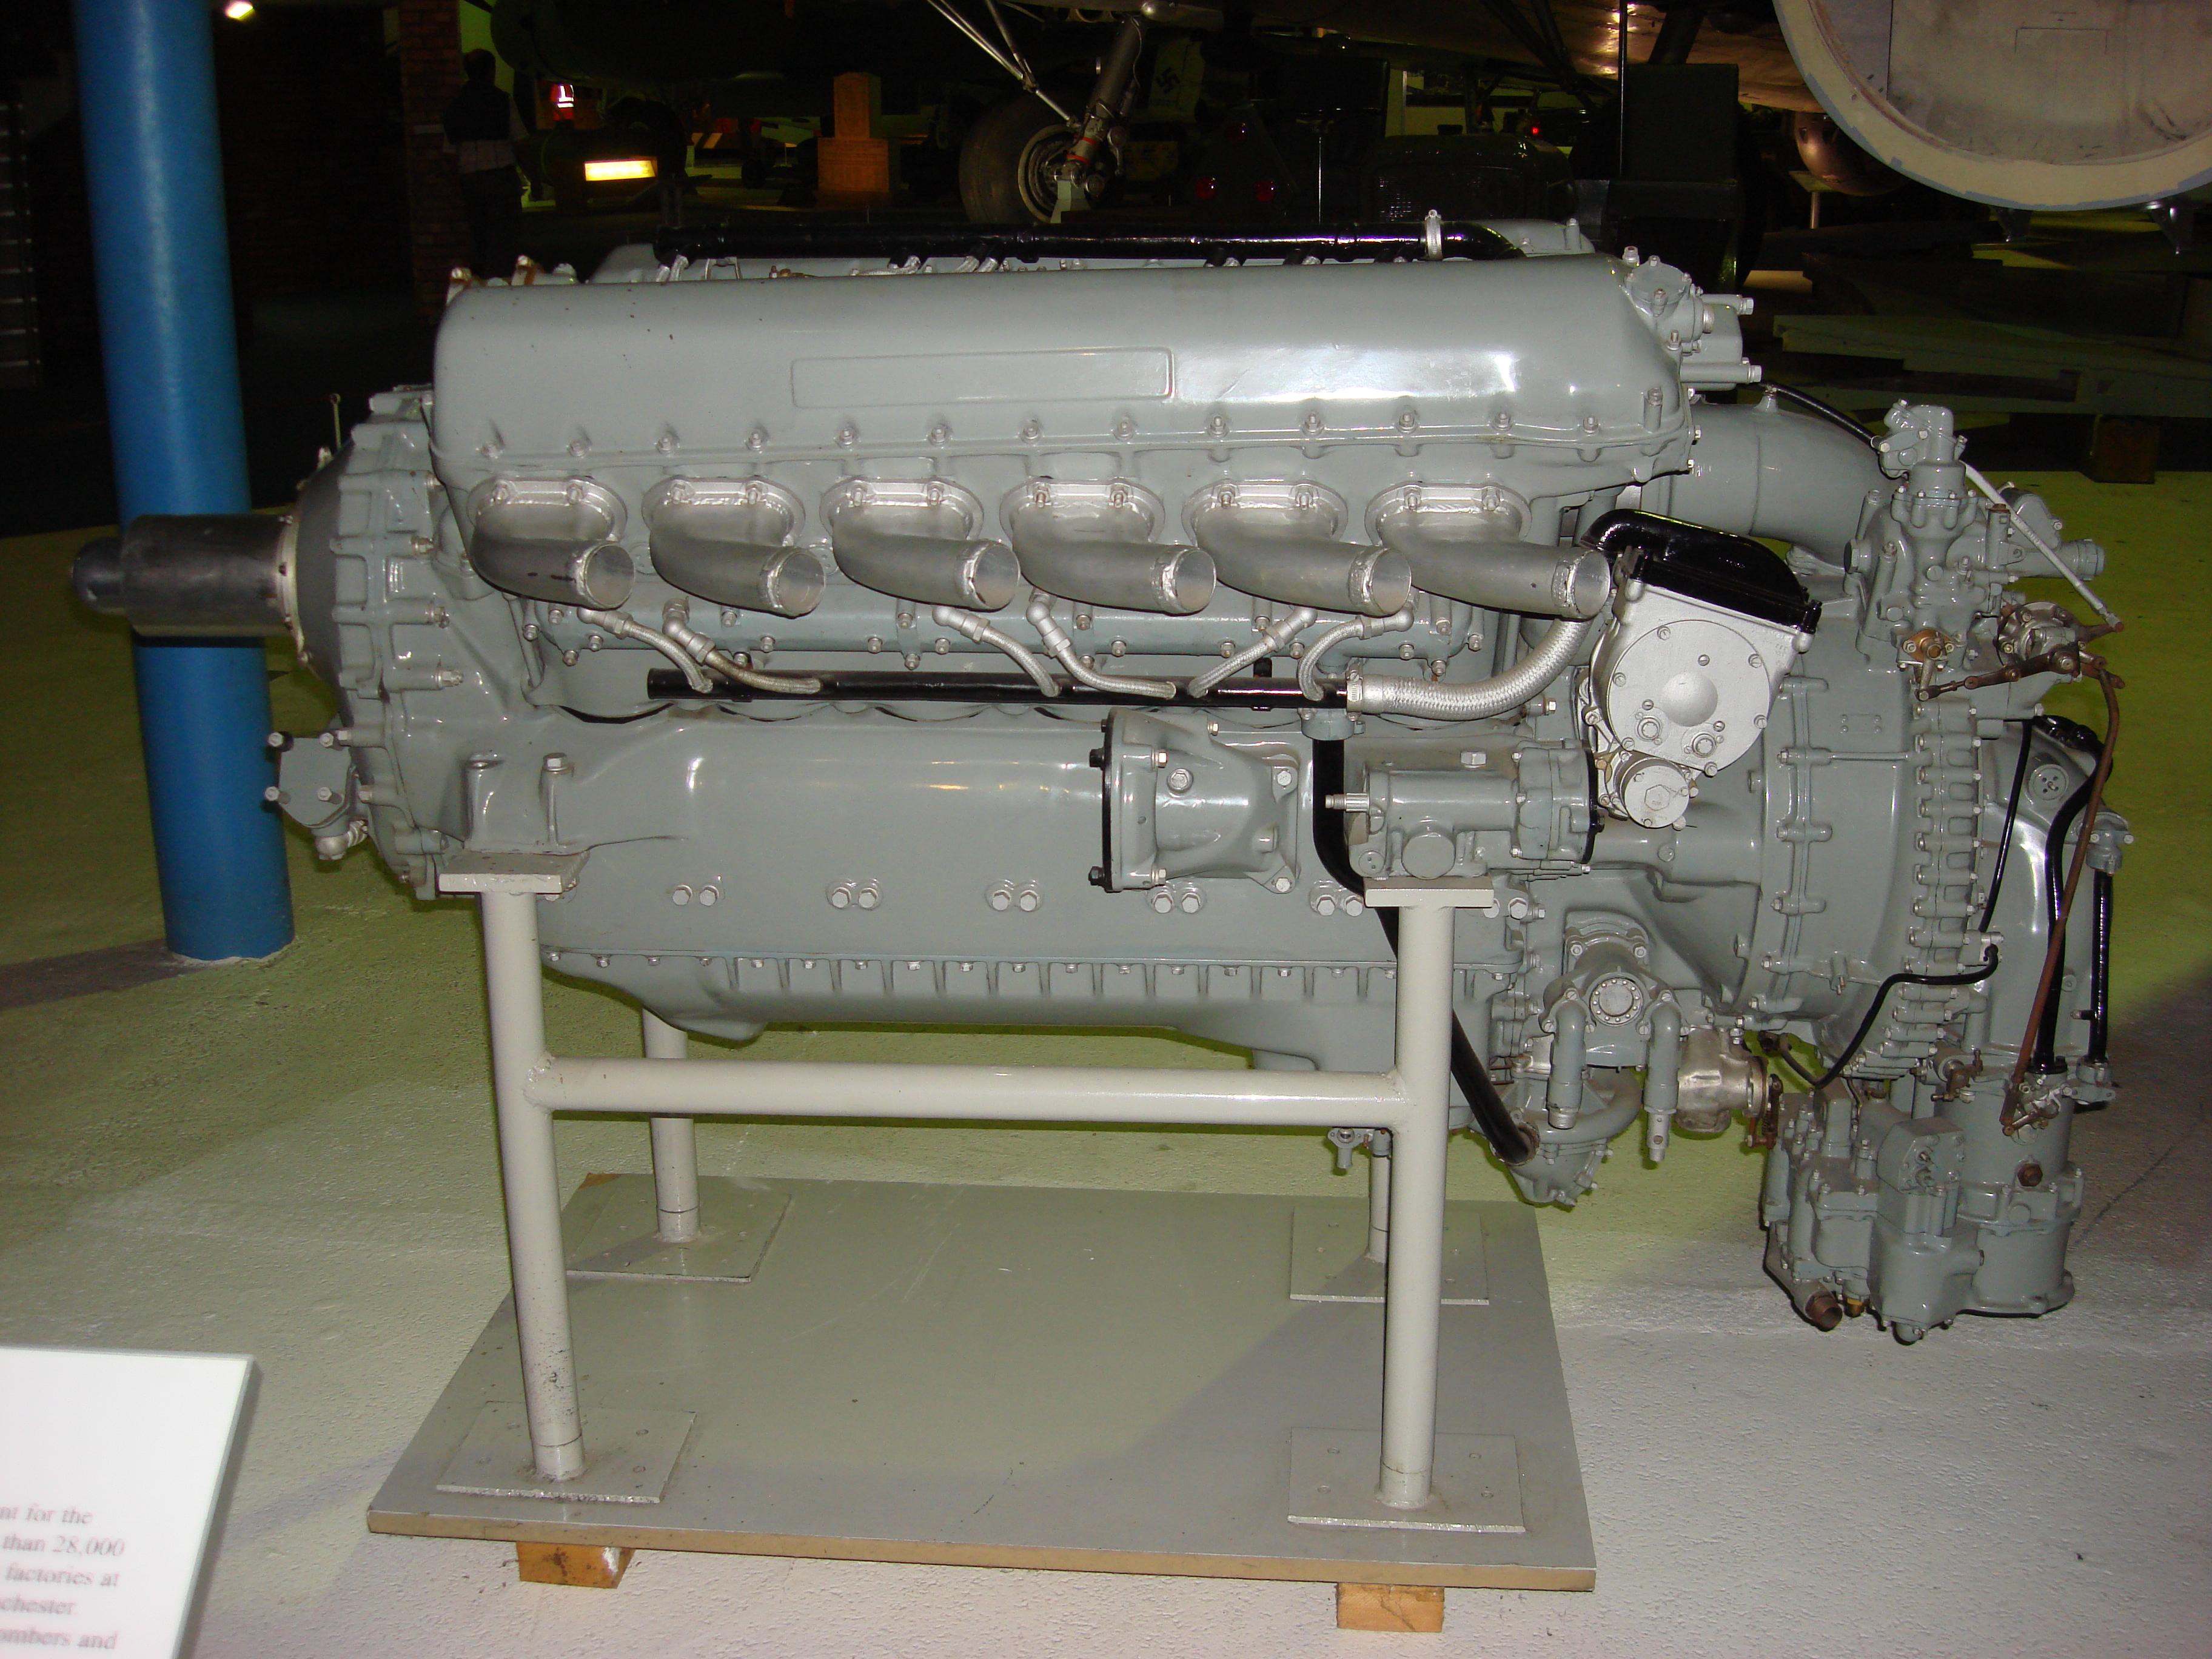 http://upload.wikimedia.org/wikipedia/commons/b/b0/Rolls_Royce_Merlin_XX.jpg